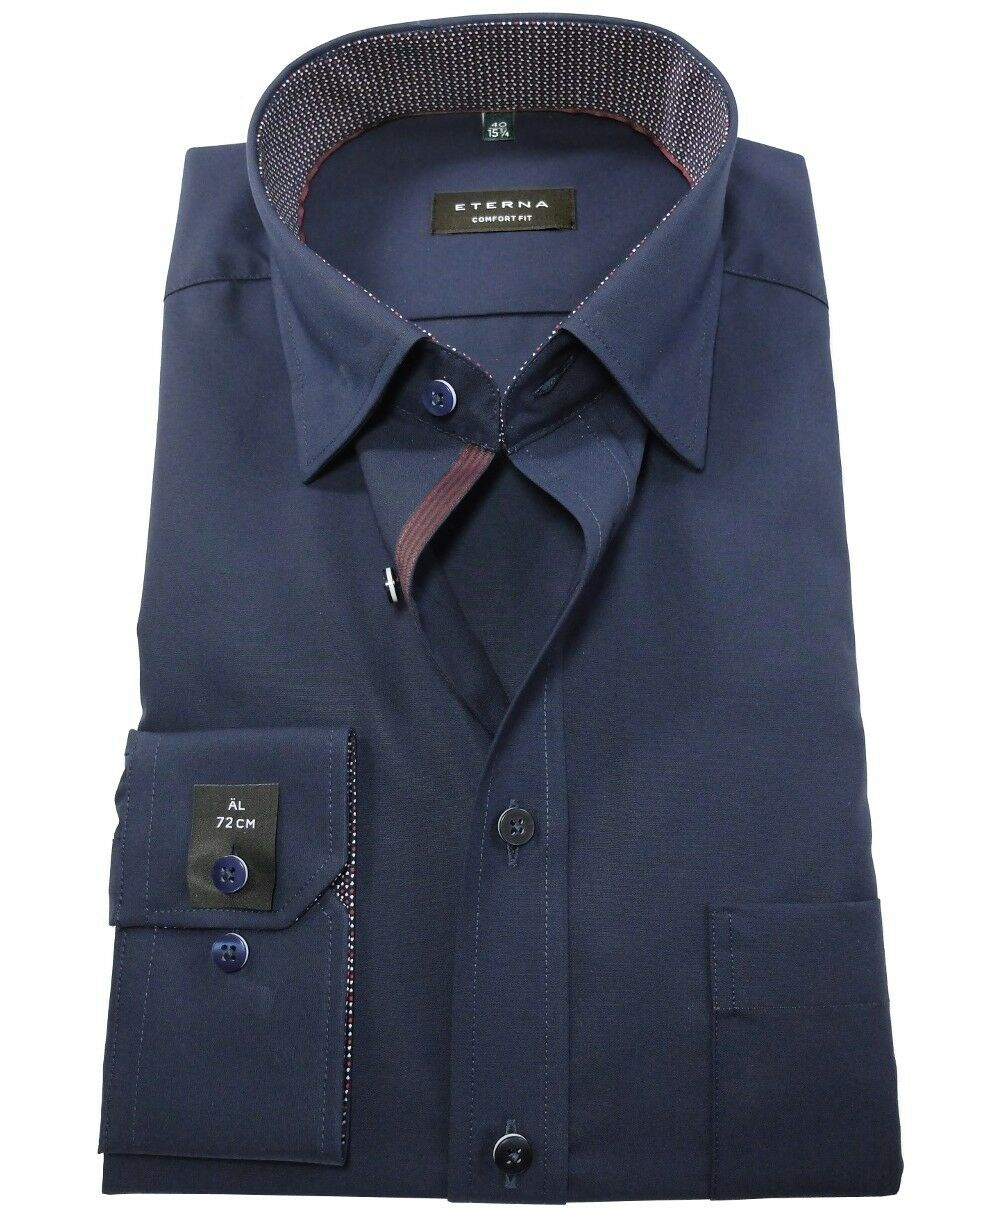 Eterna Comfort Fit Langarmhemd dunkelblau extralanger Arm 72 cm Gr. 40 41 42